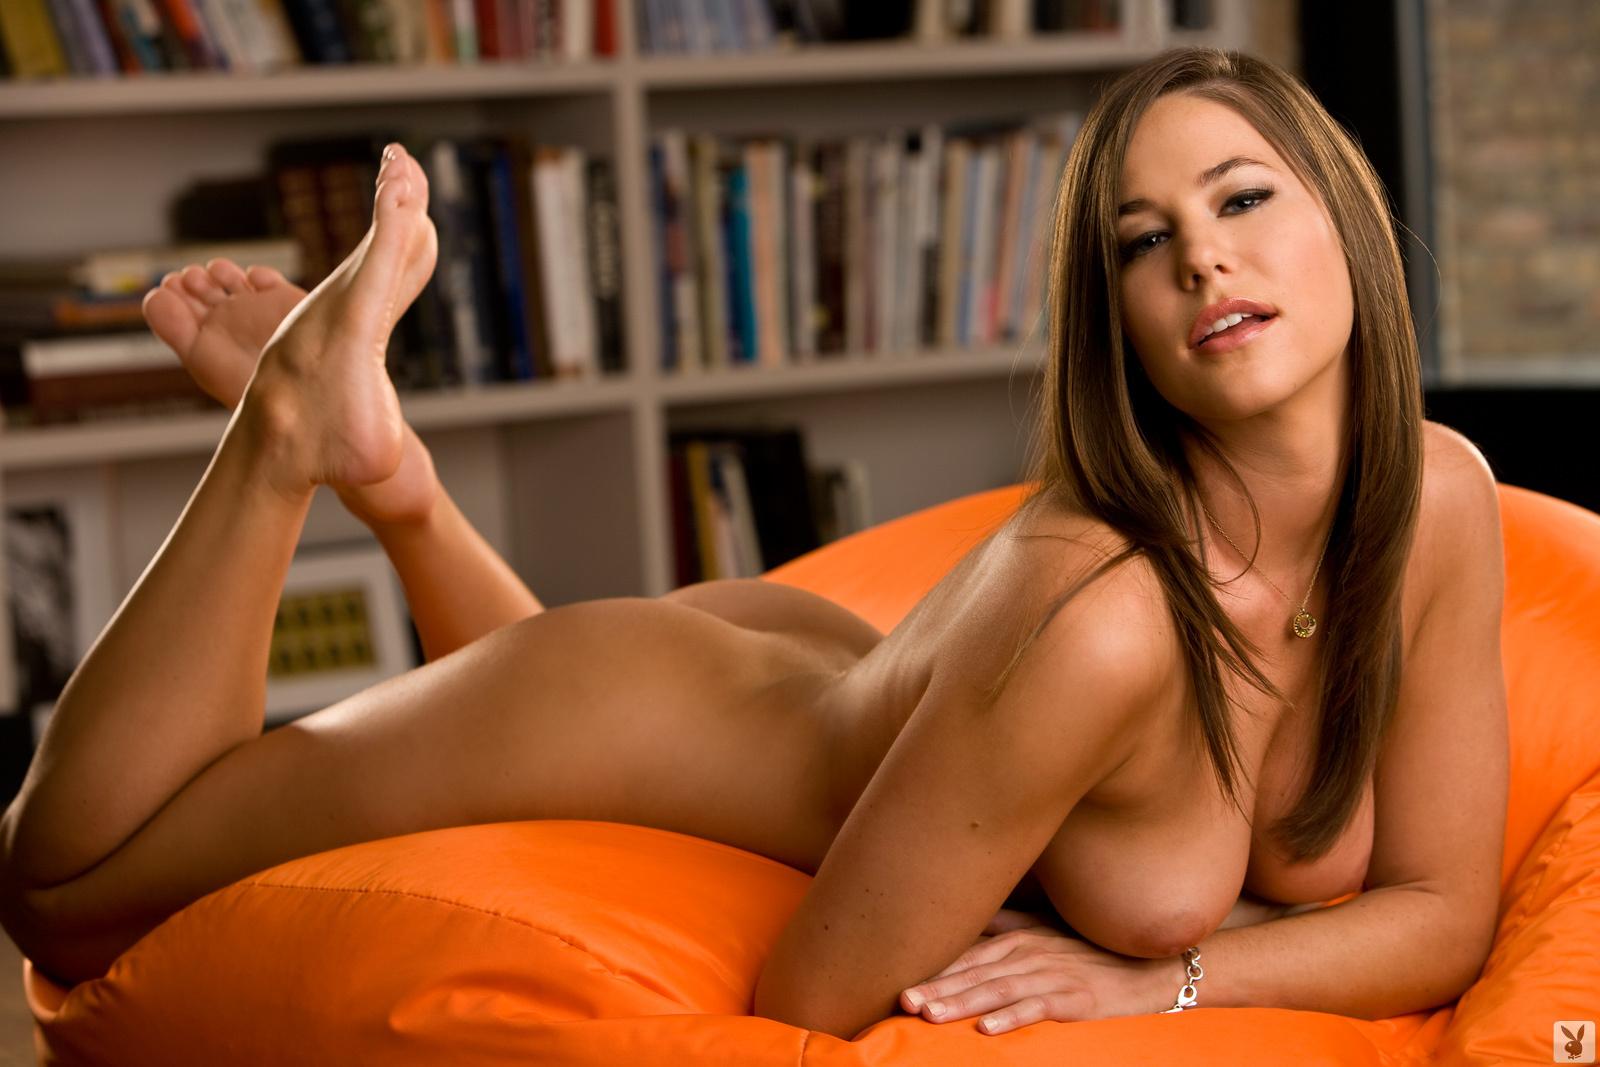 Missy tarrington nude adult model search